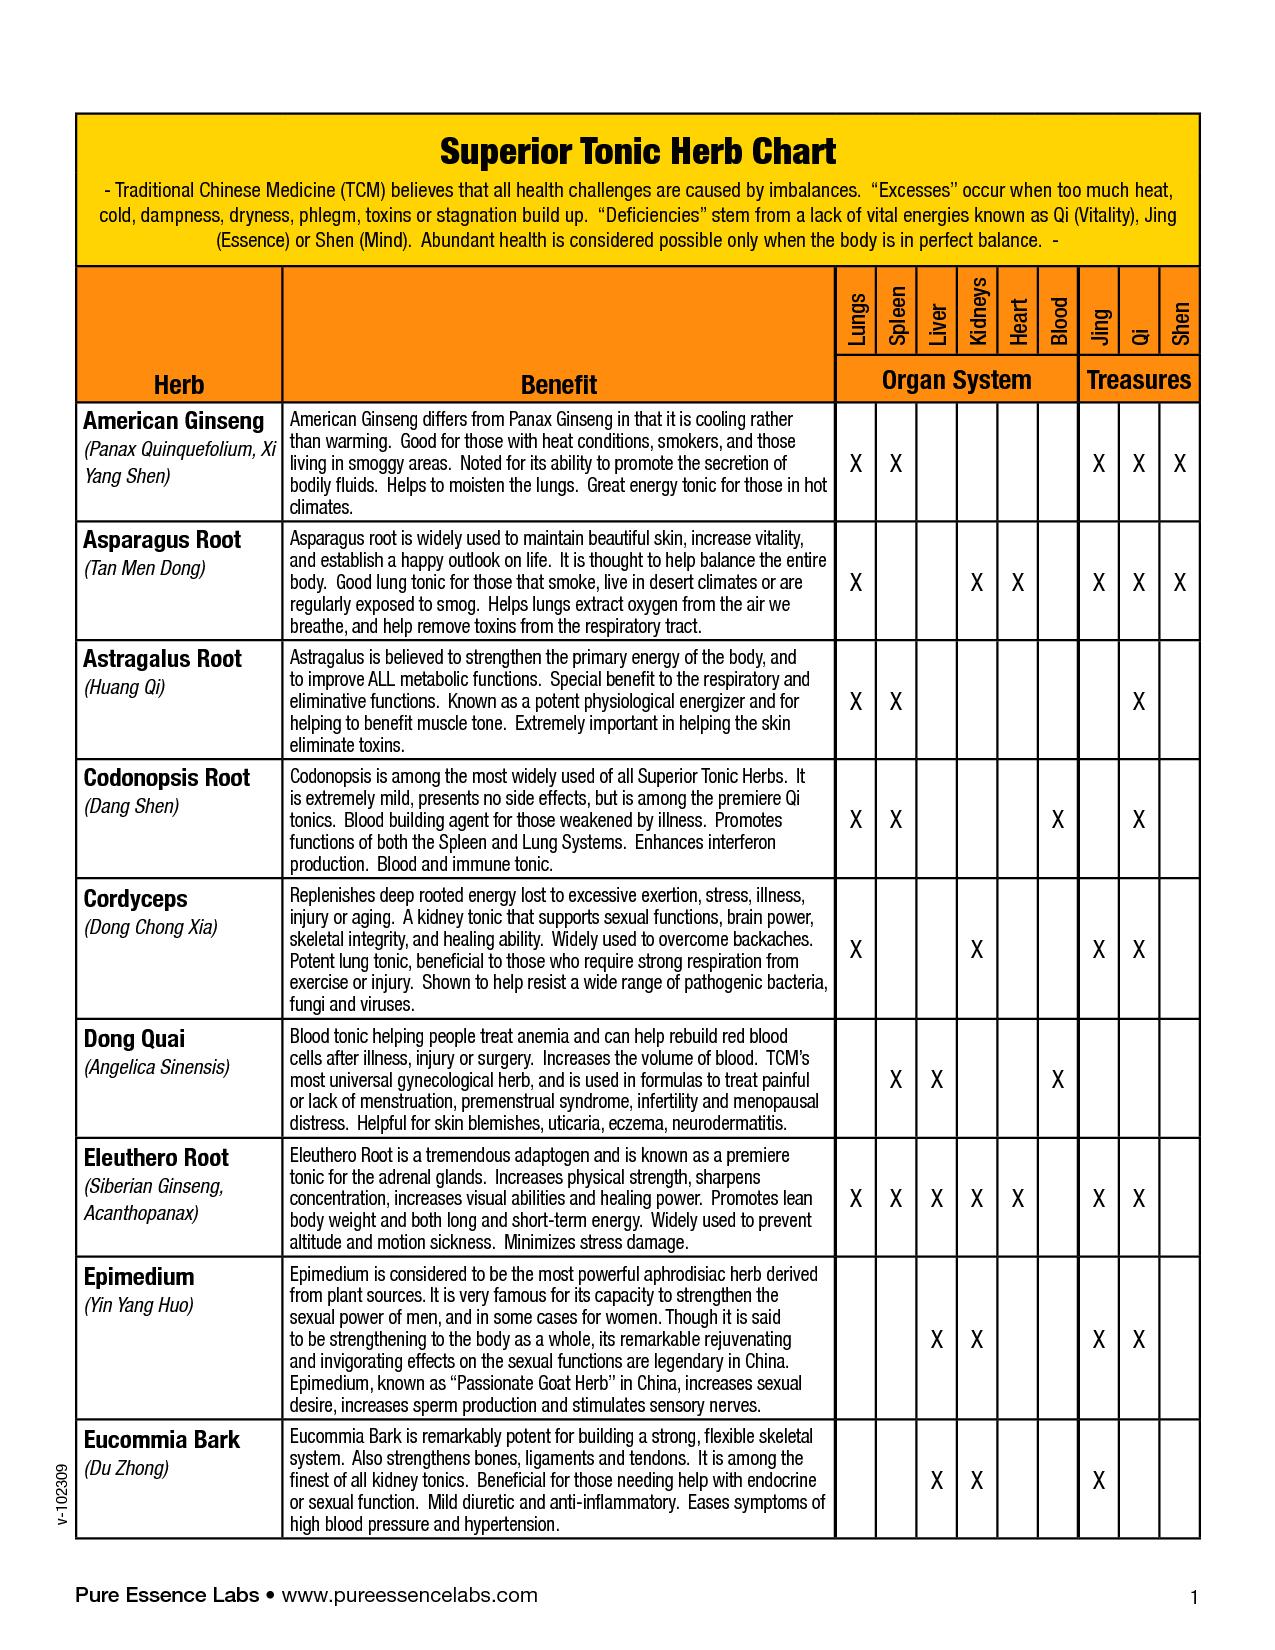 Chinese Medicine Herb Chart